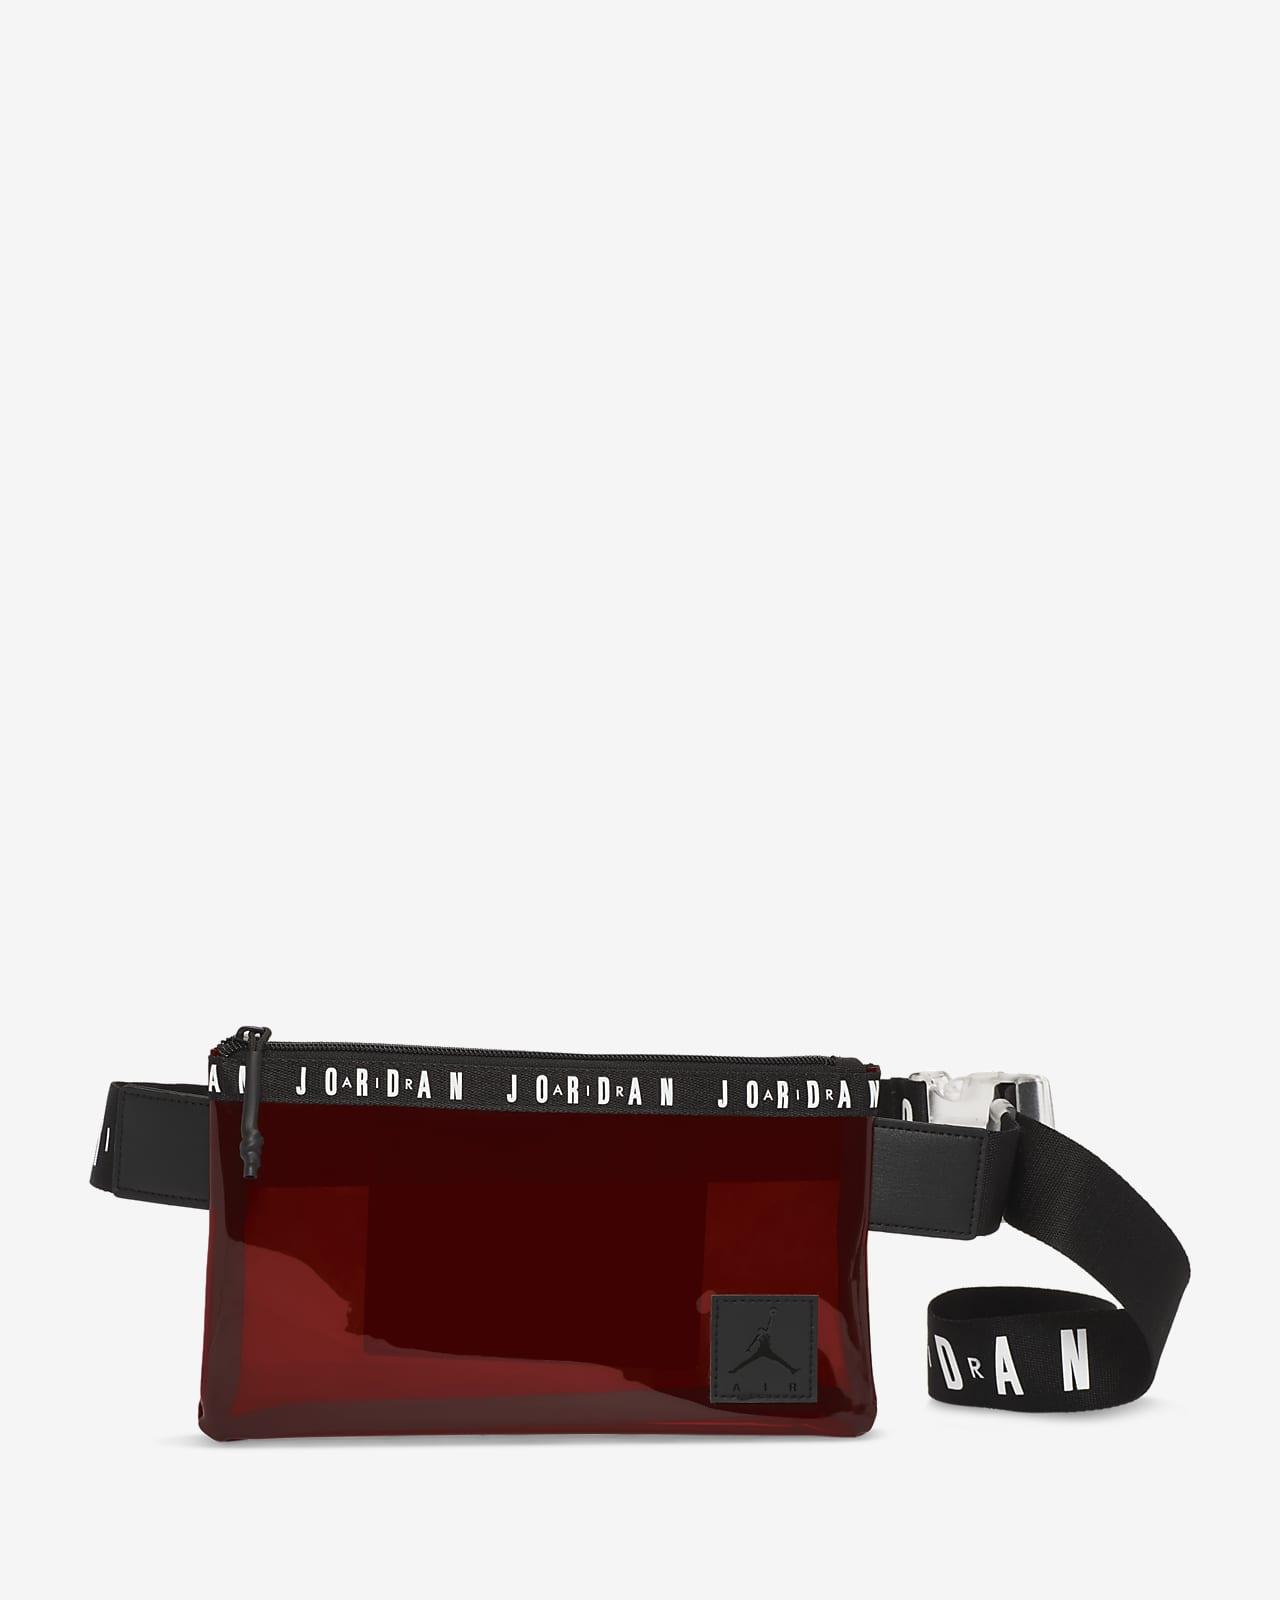 Bolsa de cintura Air Jordan (pequena)